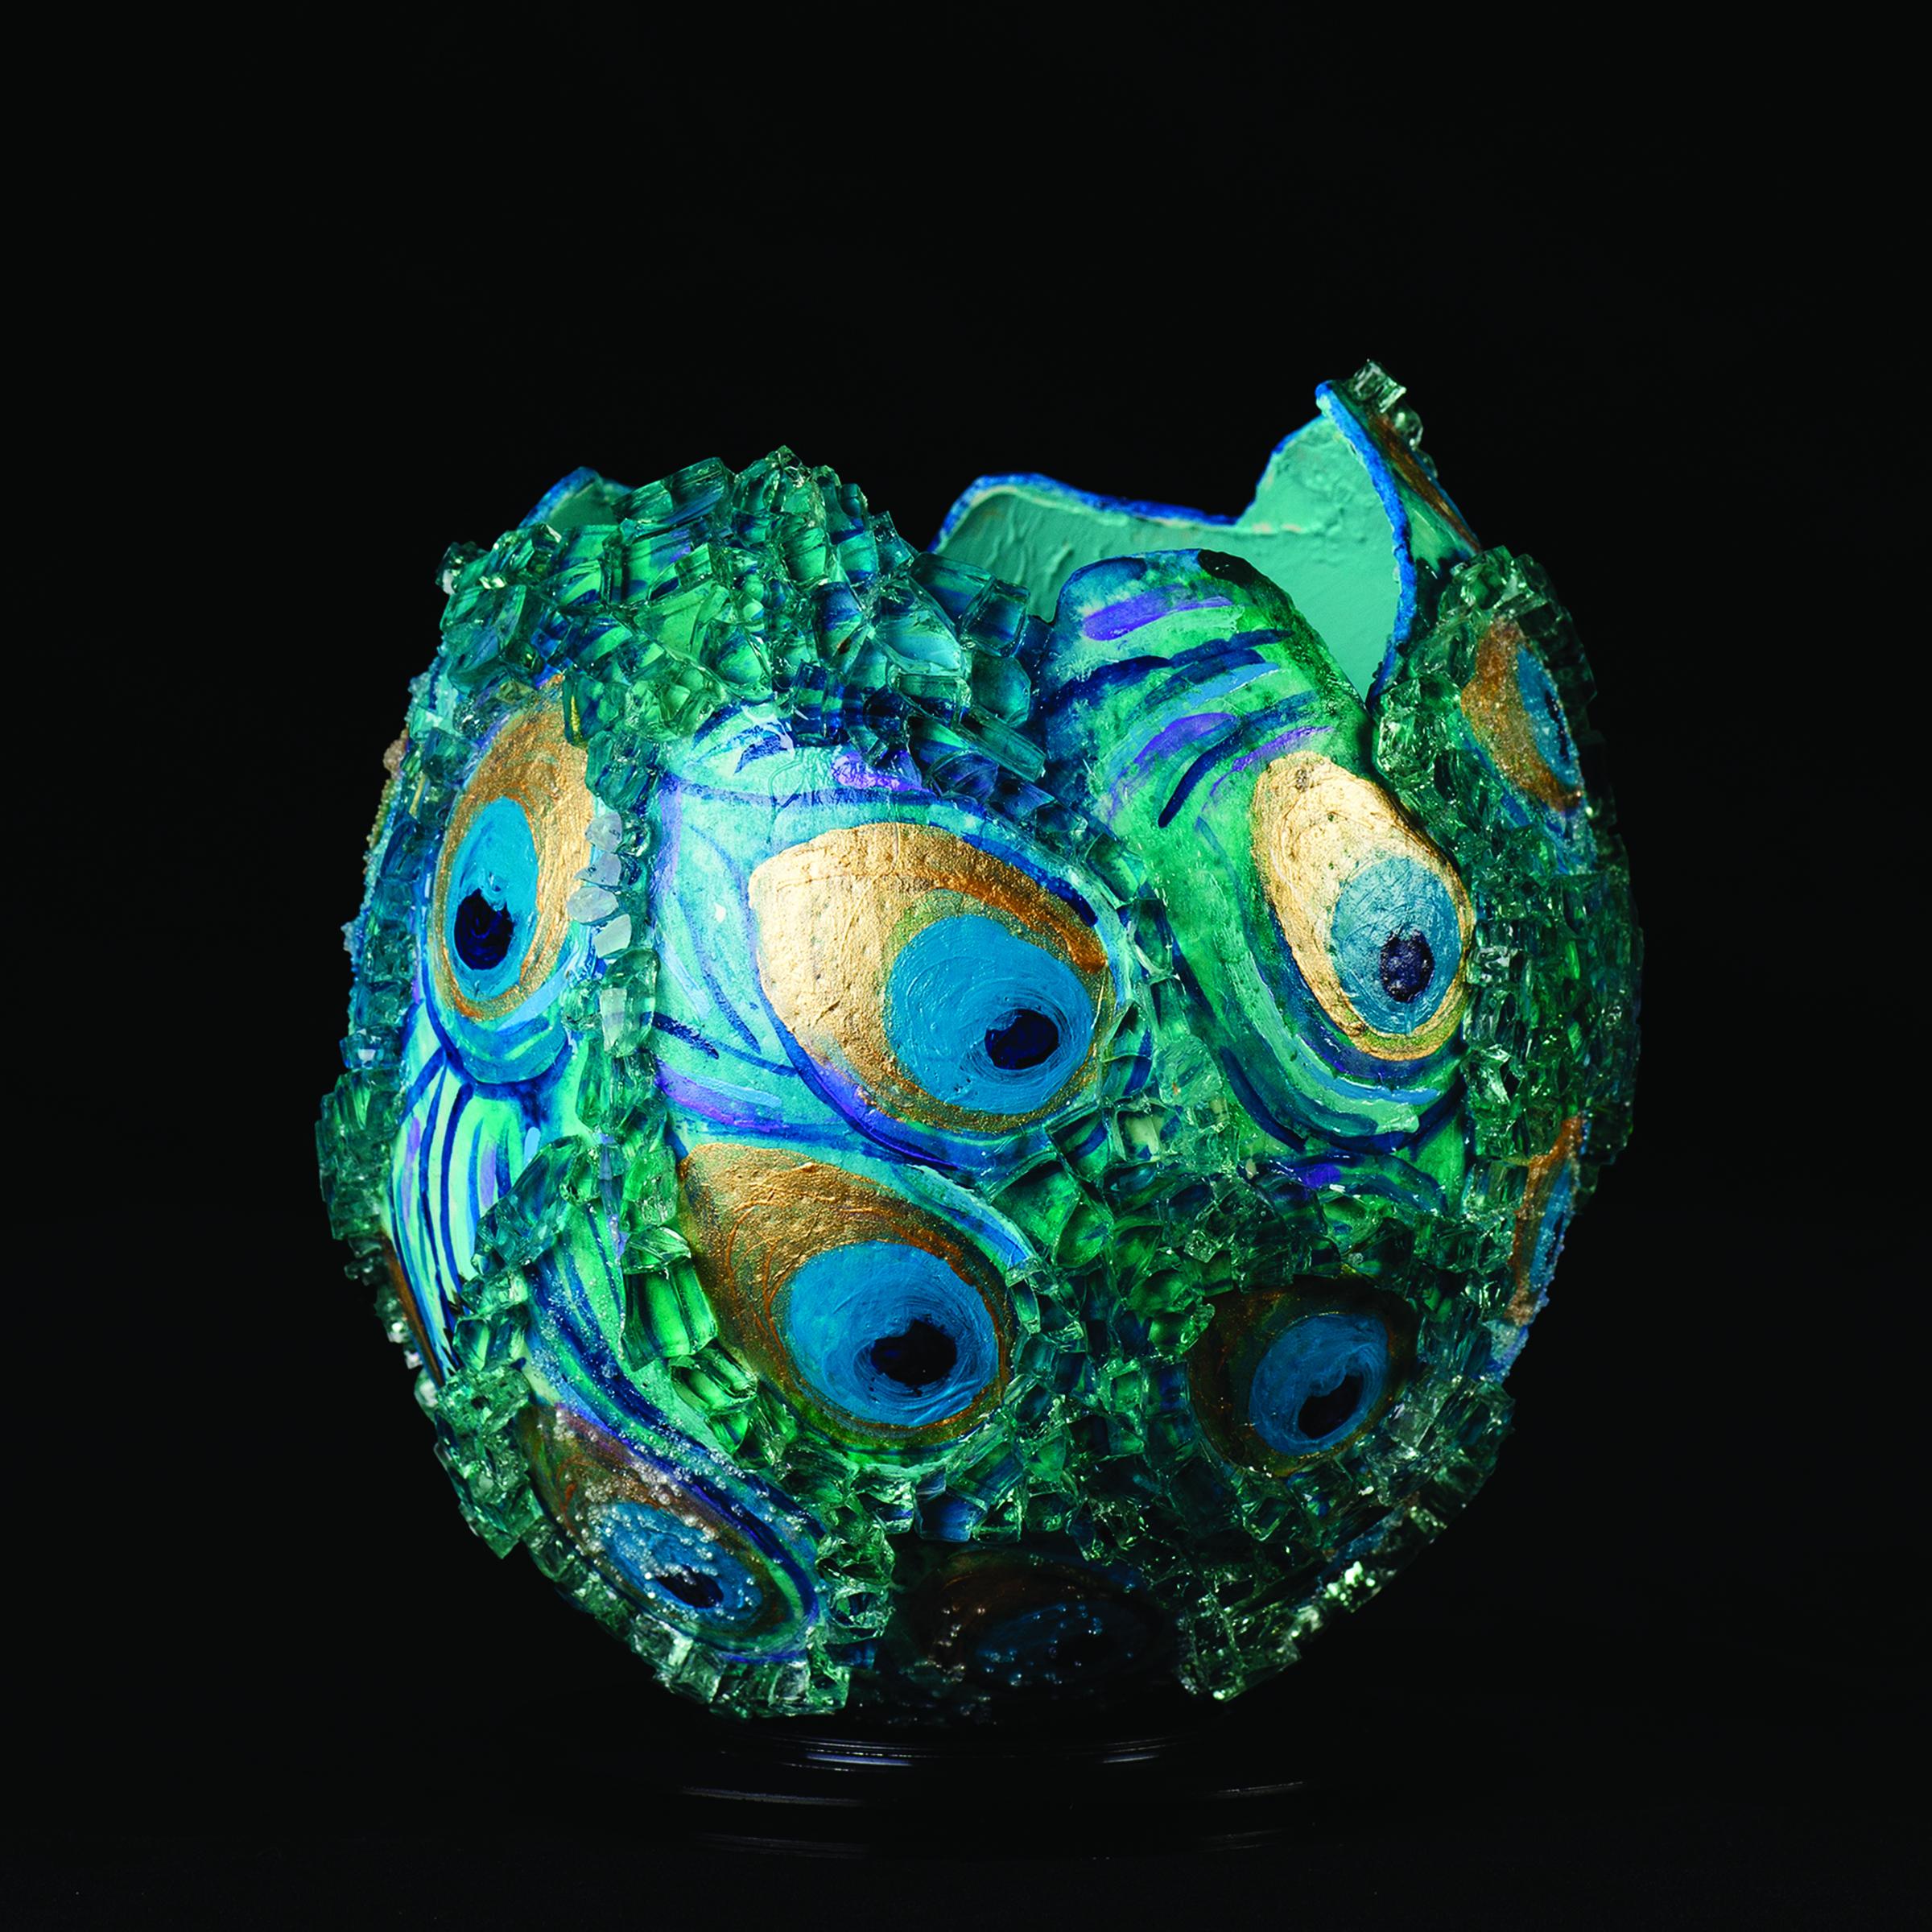 April Sunami I UN-WHOLE VISION I oil paint, acrylic, glass